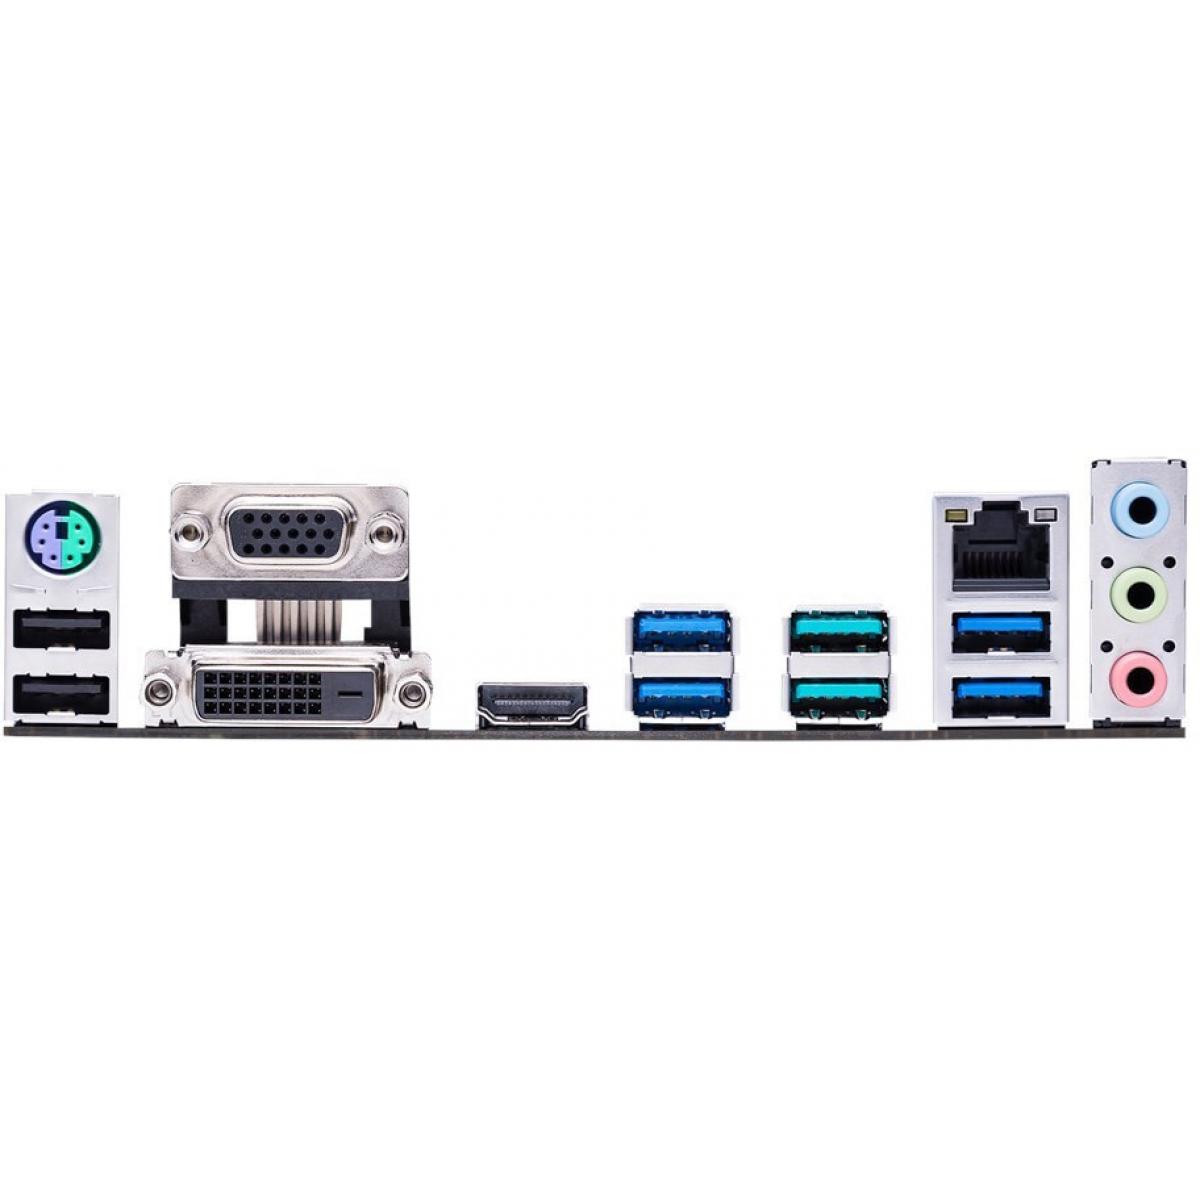 Placa Mãe Asus PRIME X370-A, Chipset X370, AMD AM4, ATX, DDR4